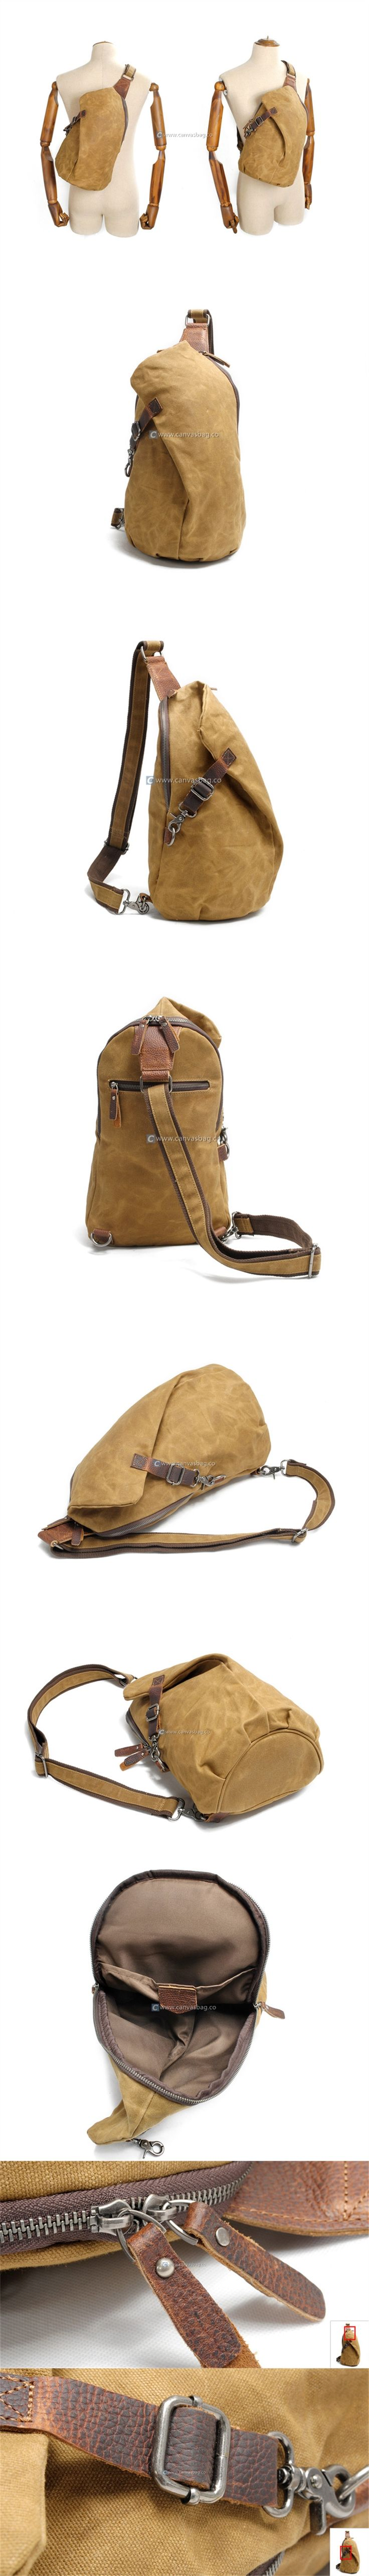 Waxed Canvas Handbags Canvas Sling Backpack